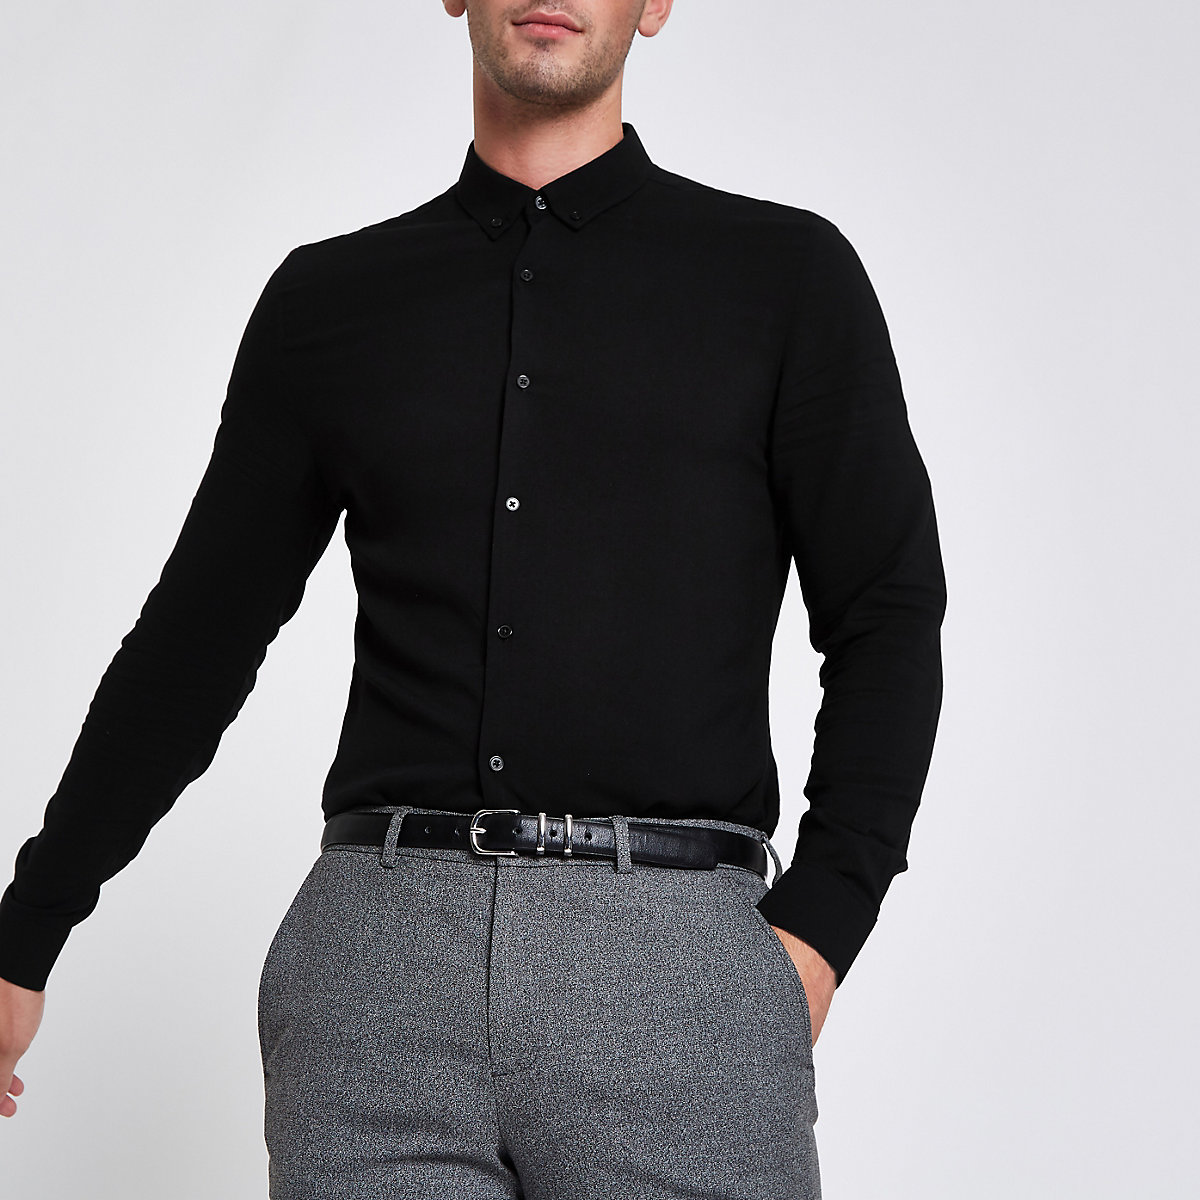 Black Button Down Long Sleeve Shirt